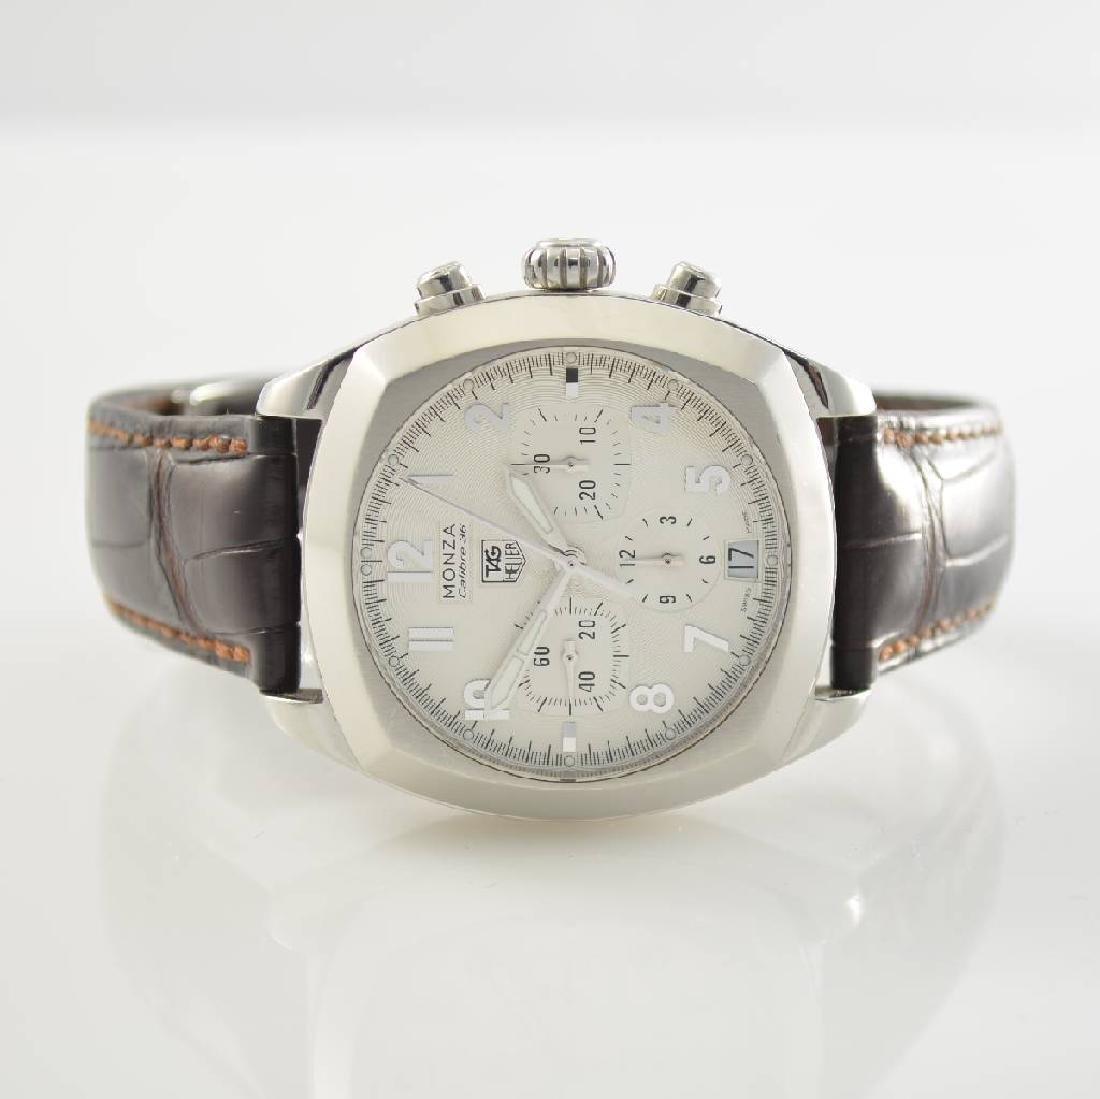 TAG HEUER intermediate wheel chronograph model Monza